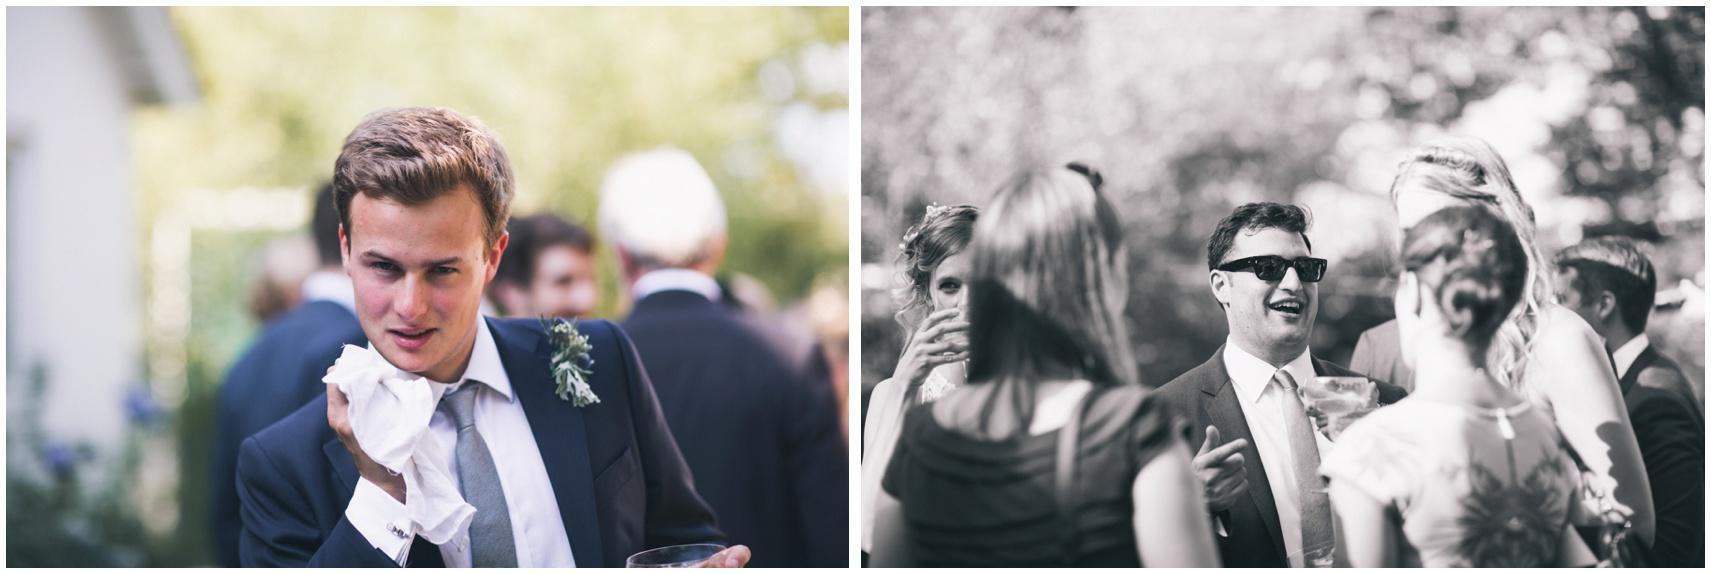 BMC Wedding photography Rutland_0312.jpg